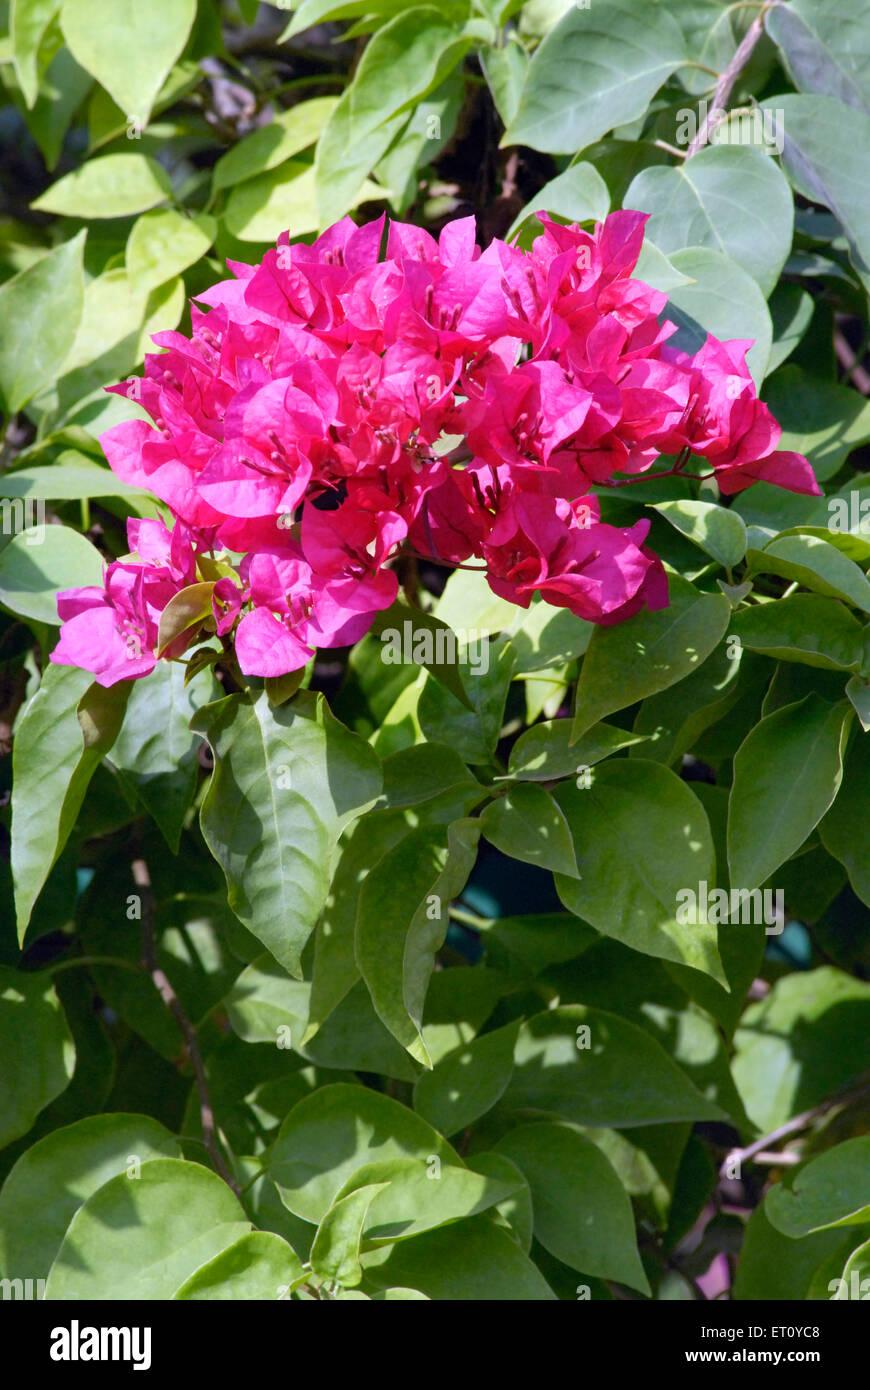 India Bougainvillea Flowers Stock Photos & India Bougainvillea ...